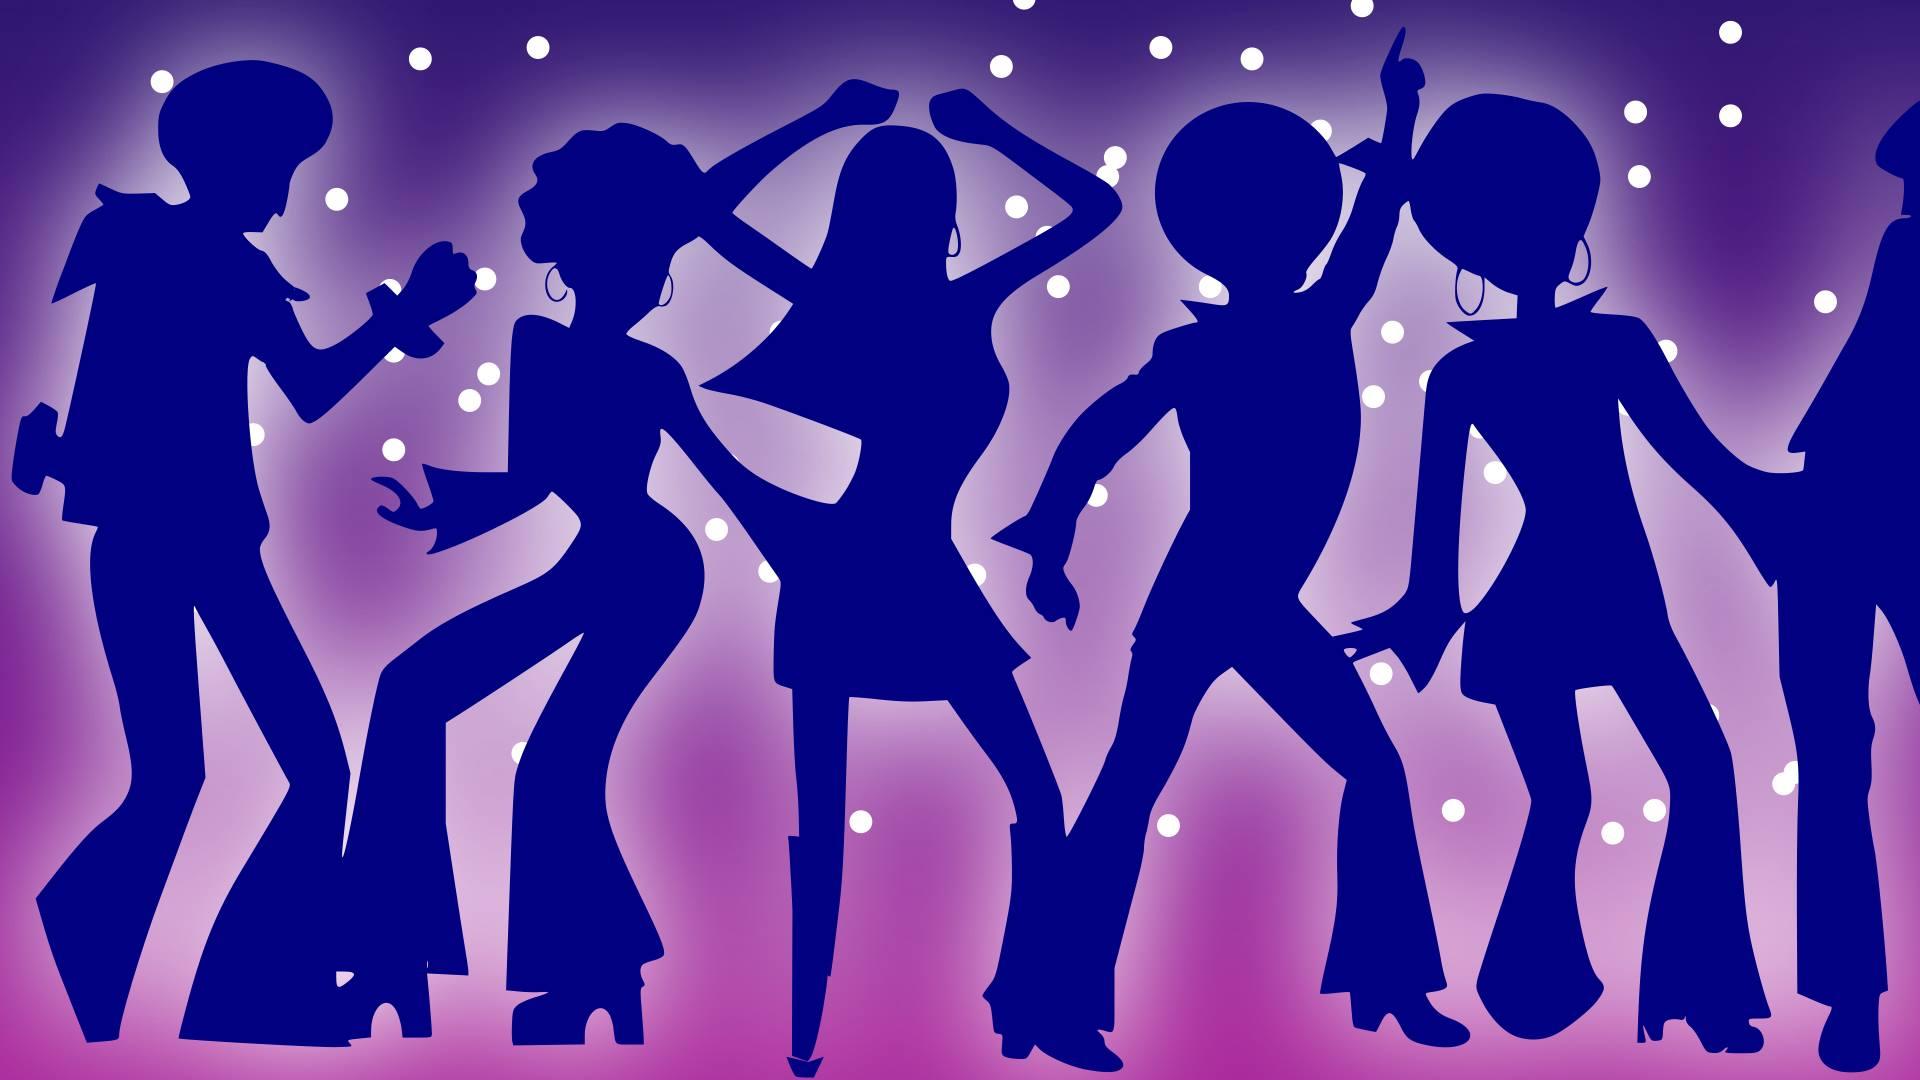 Disco Dance Party with Tight Hair Disco Band   Frances Litman 1920x1080